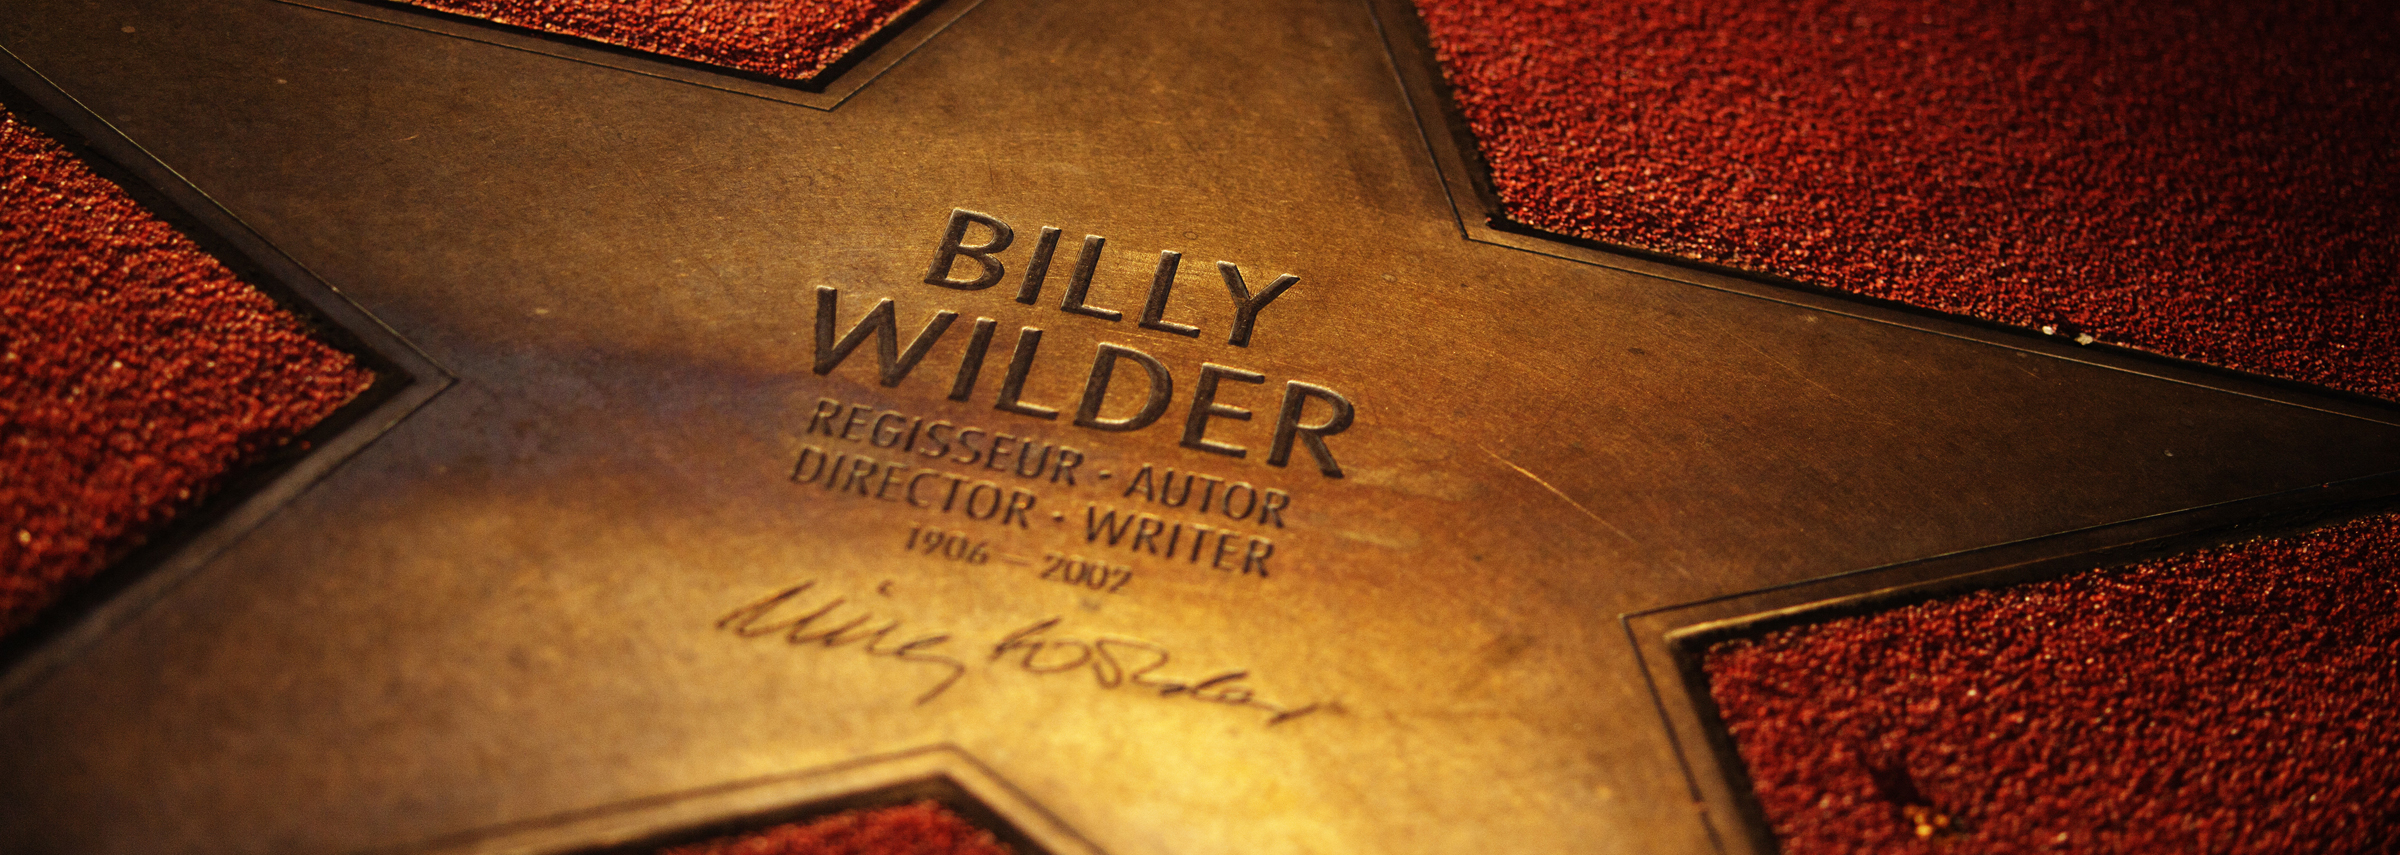 BillyWilderStar.jpg